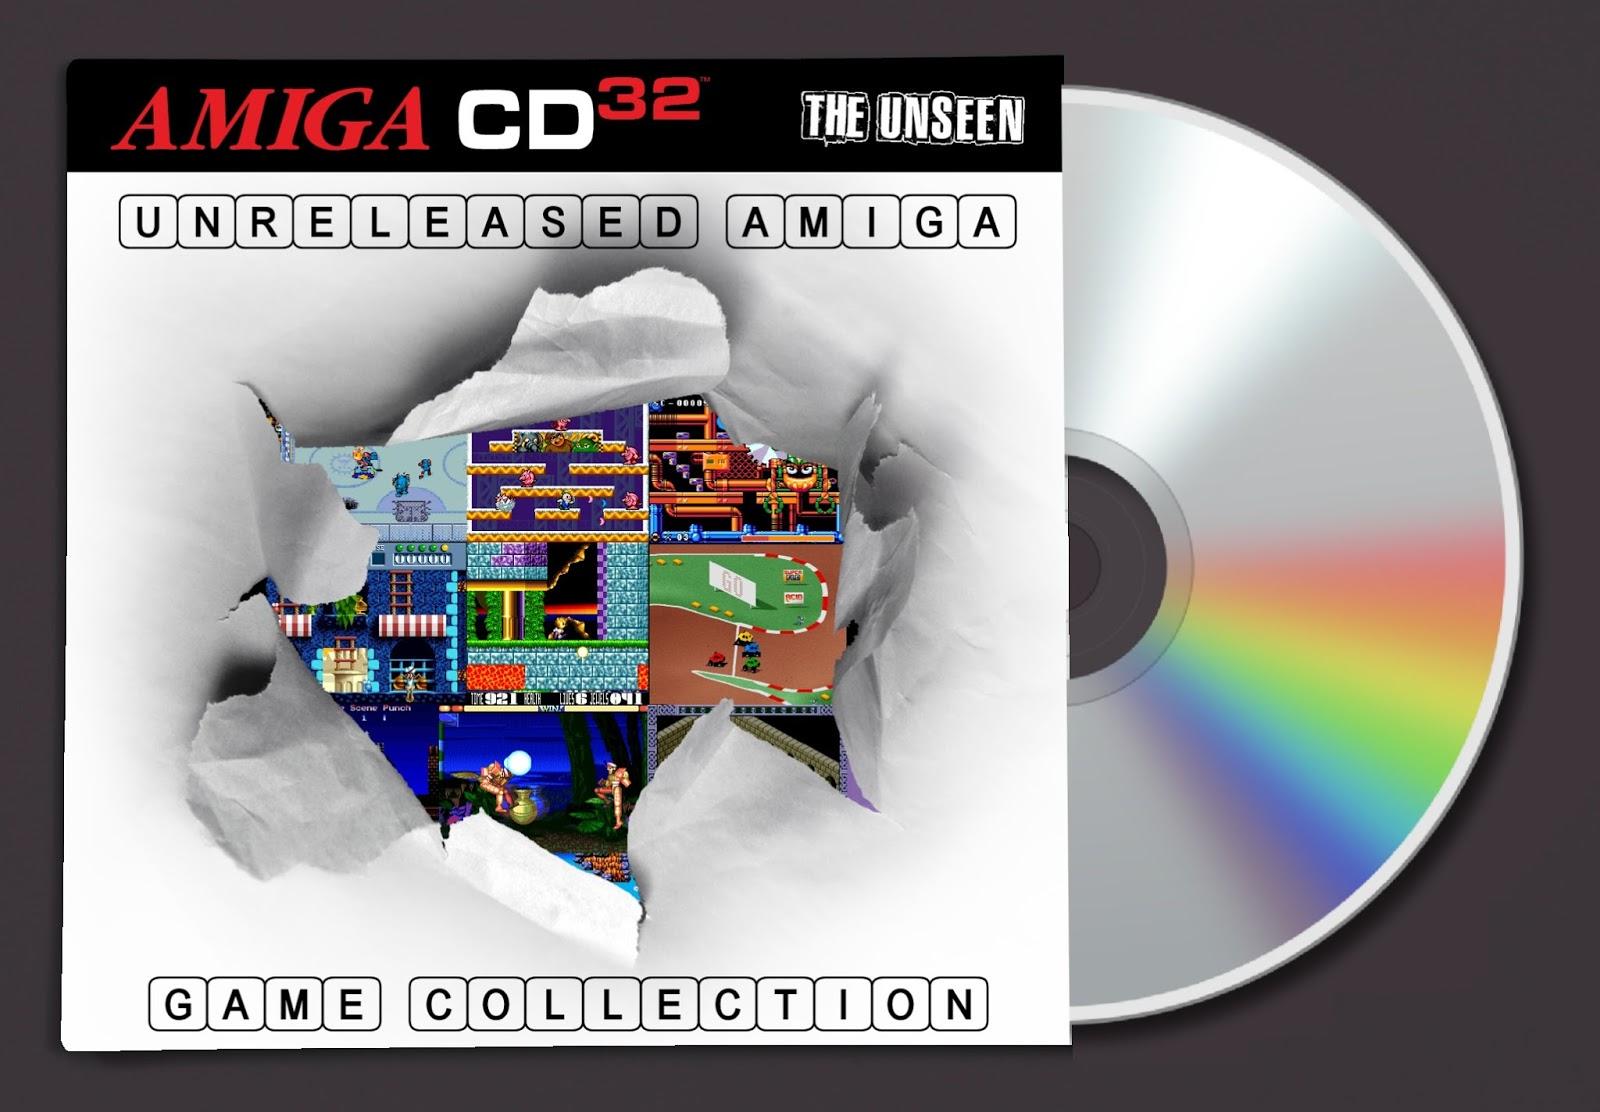 Diggers amiga cd32 game / games download adf, cheat lemon amiga.